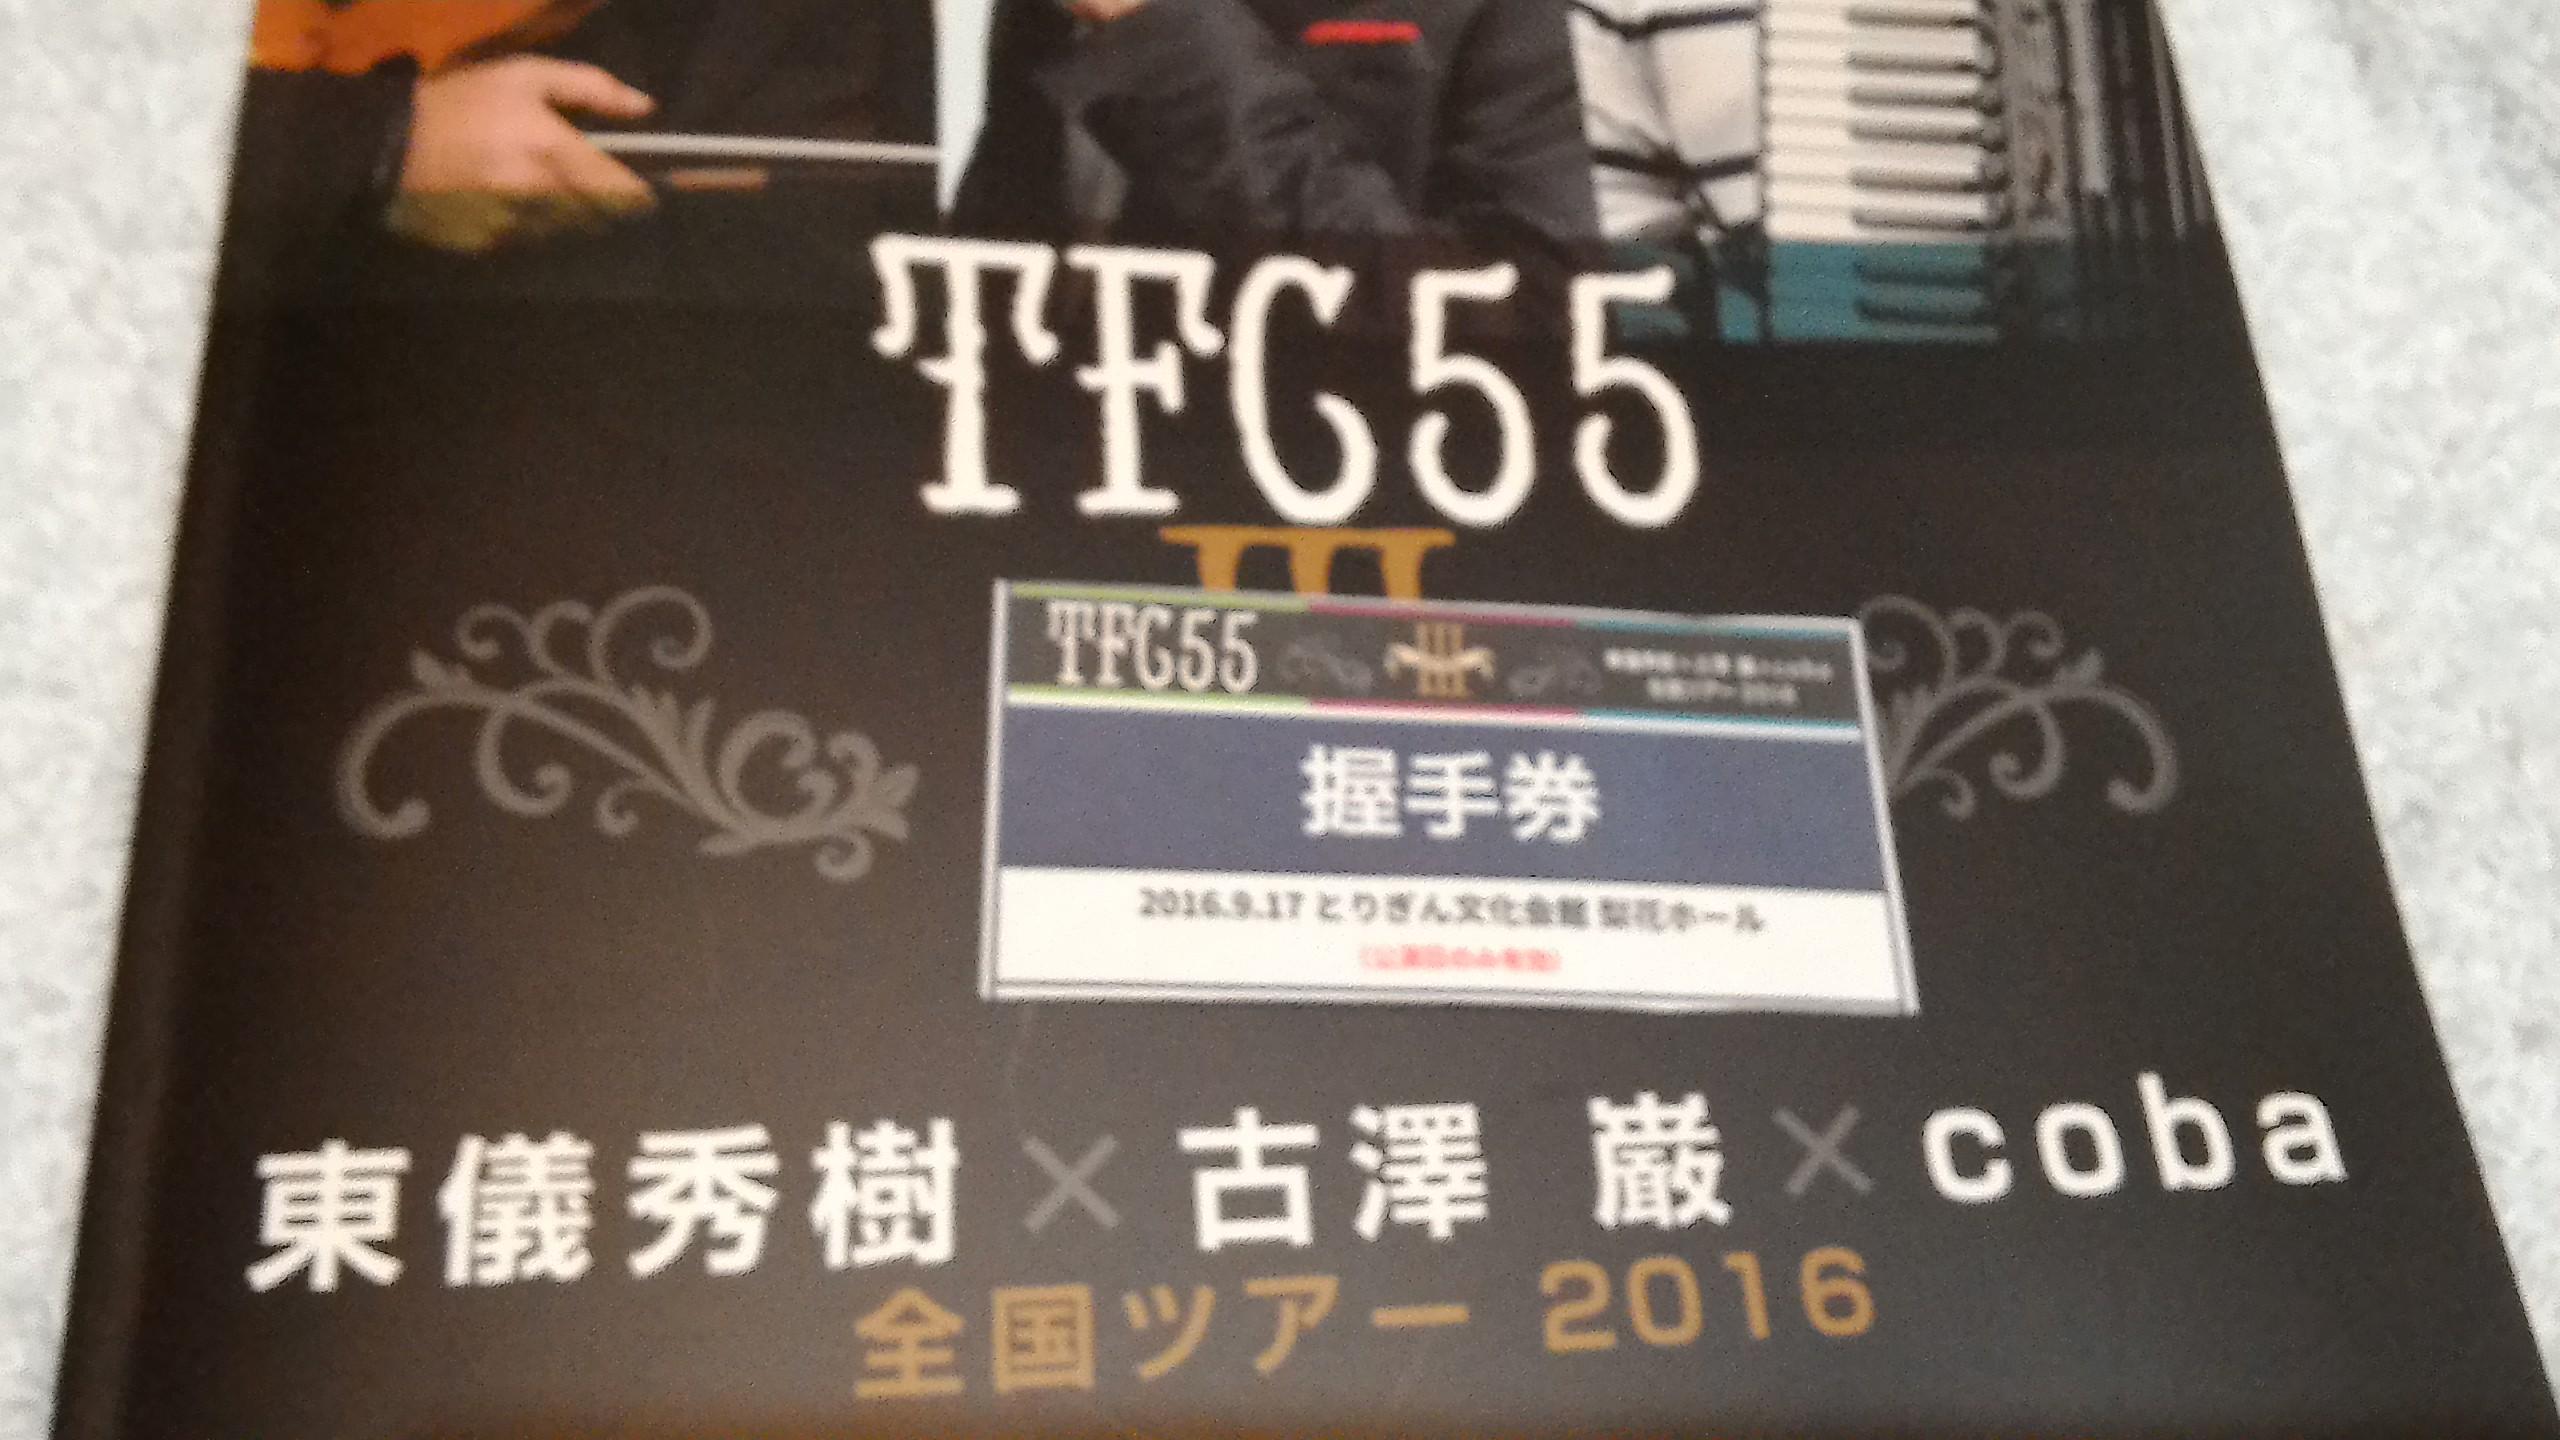 201609192131418c3.jpg